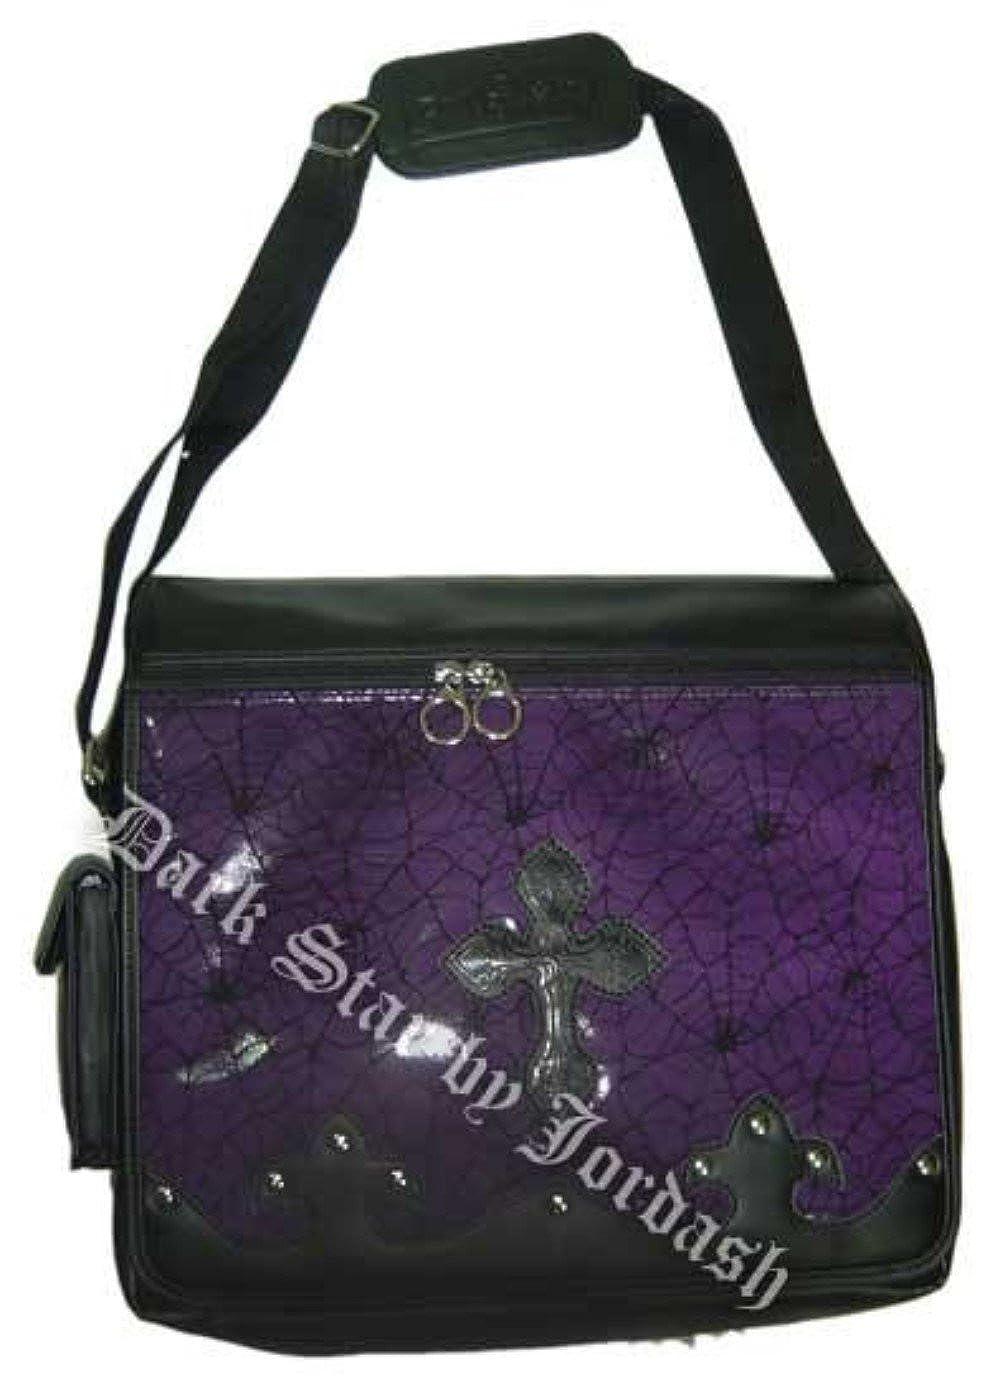 Amazon.com: Star morado oscuro gótico PVC ataúd cruz bolsa ...